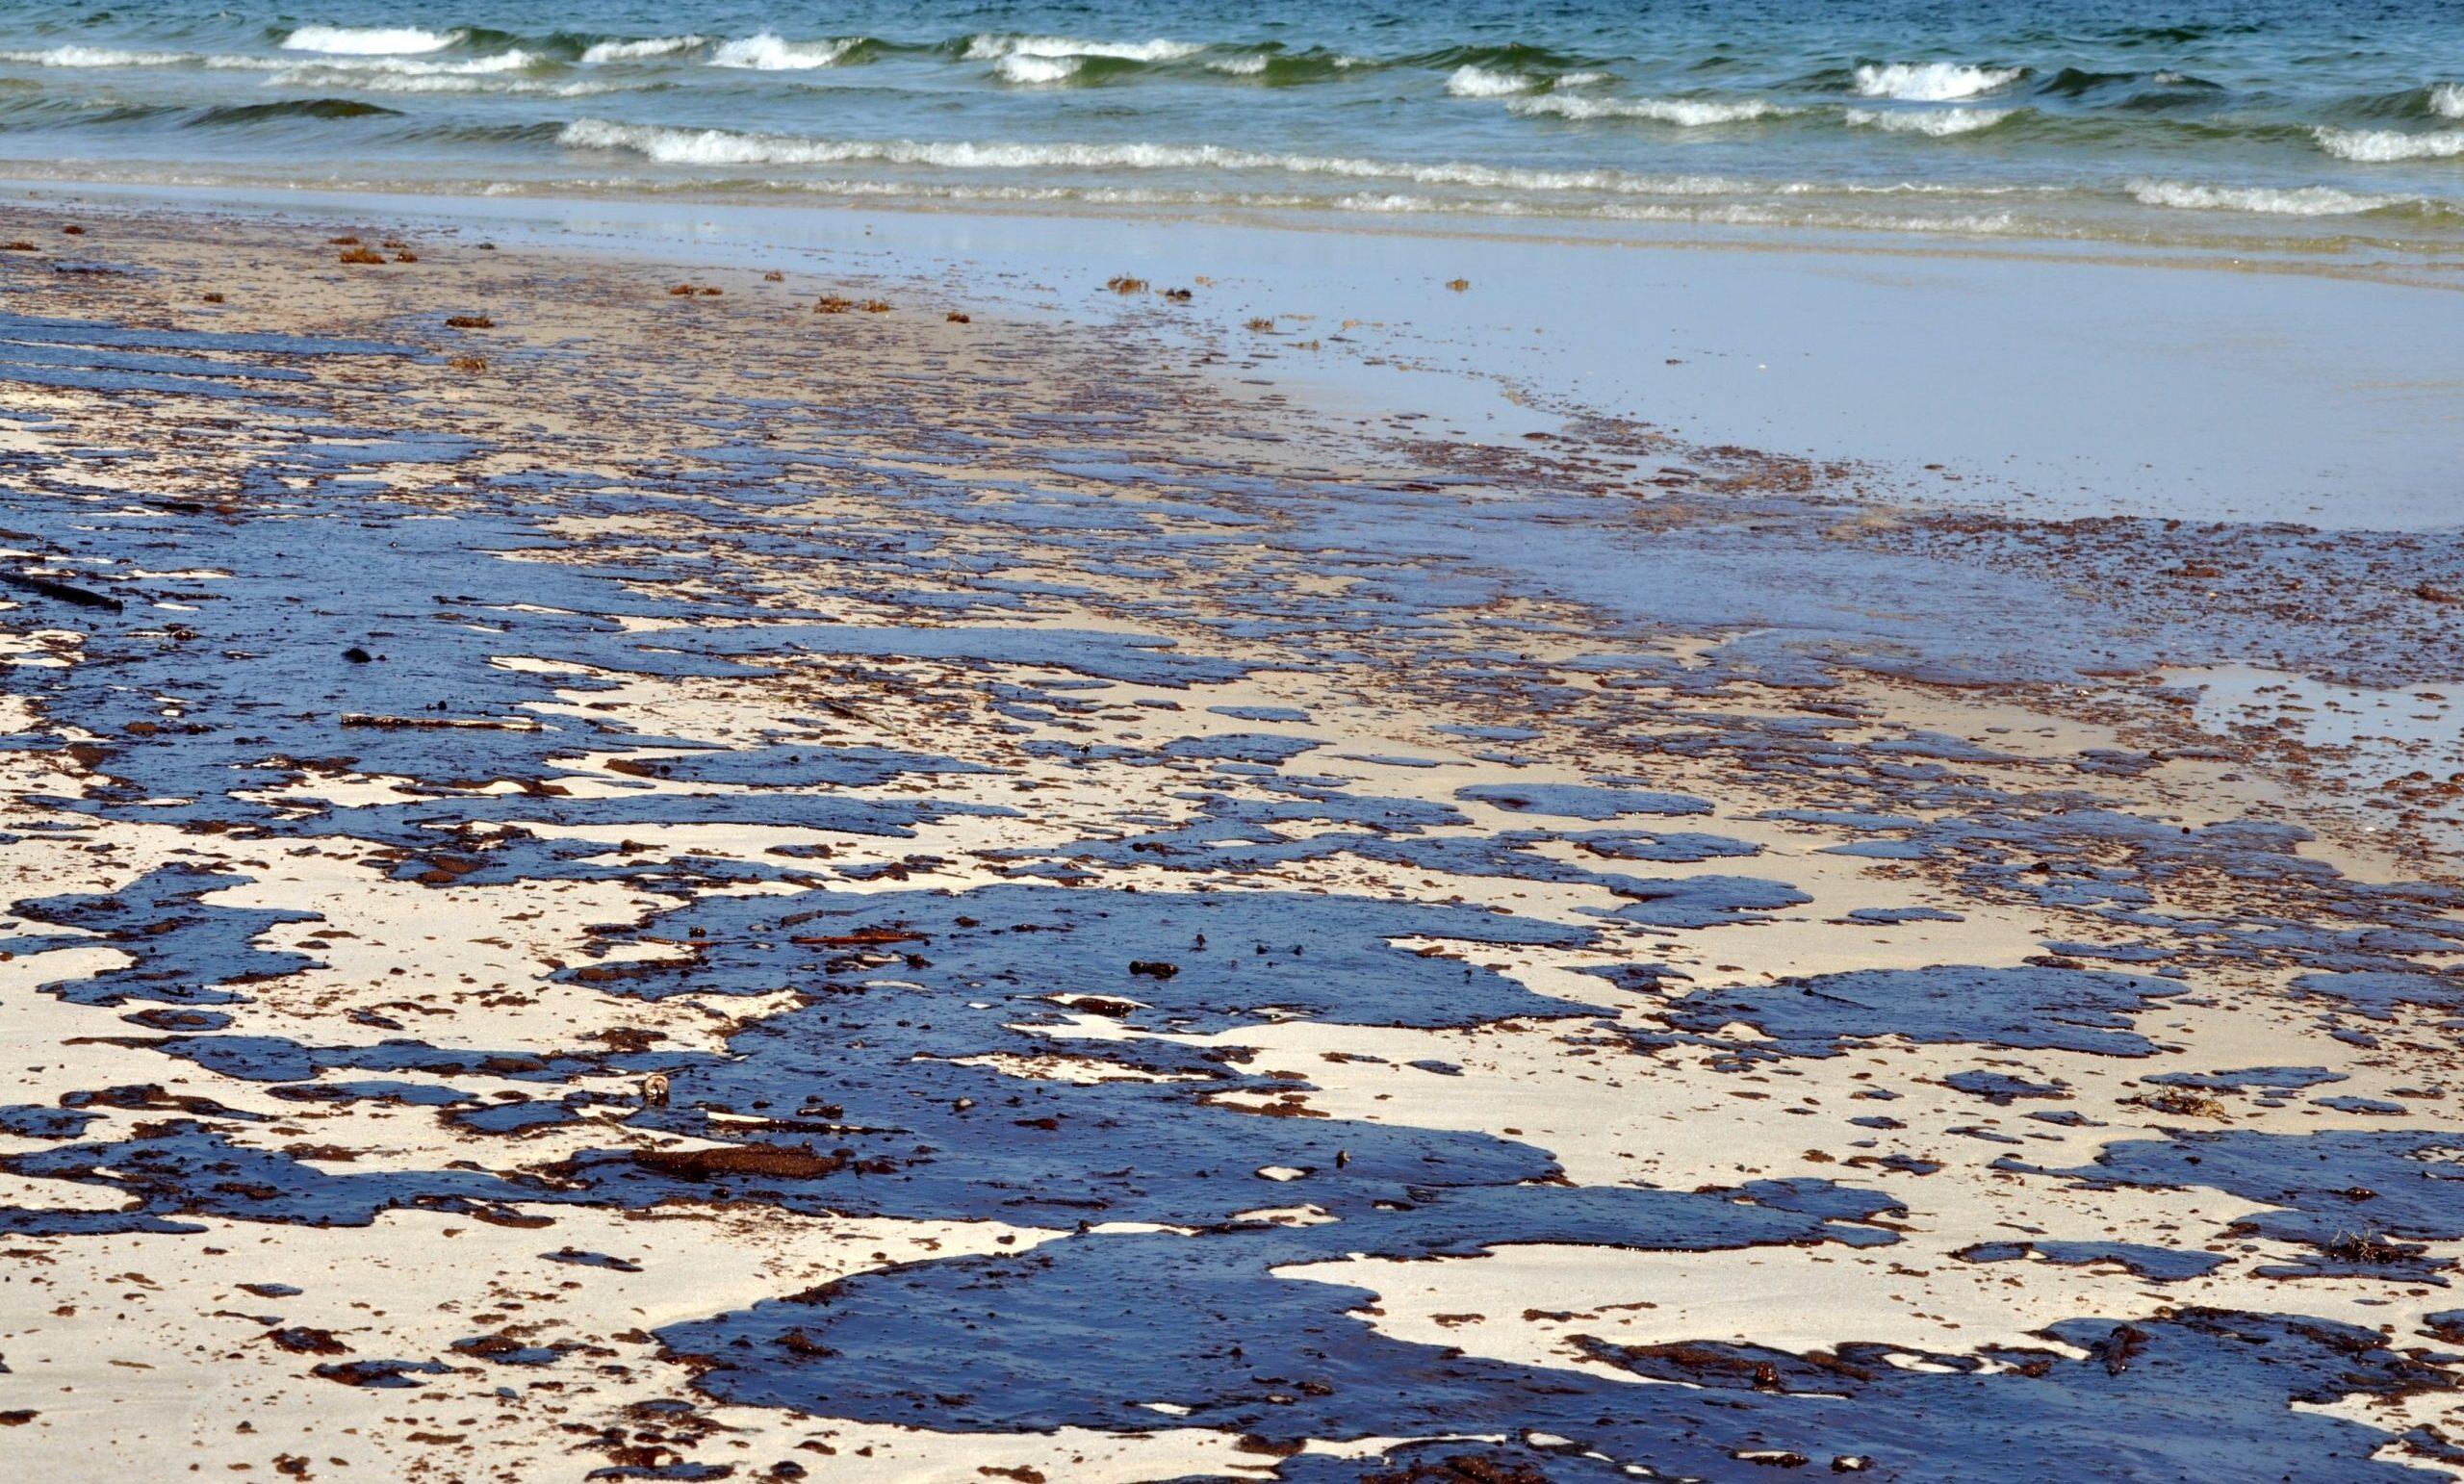 ropa na plaży